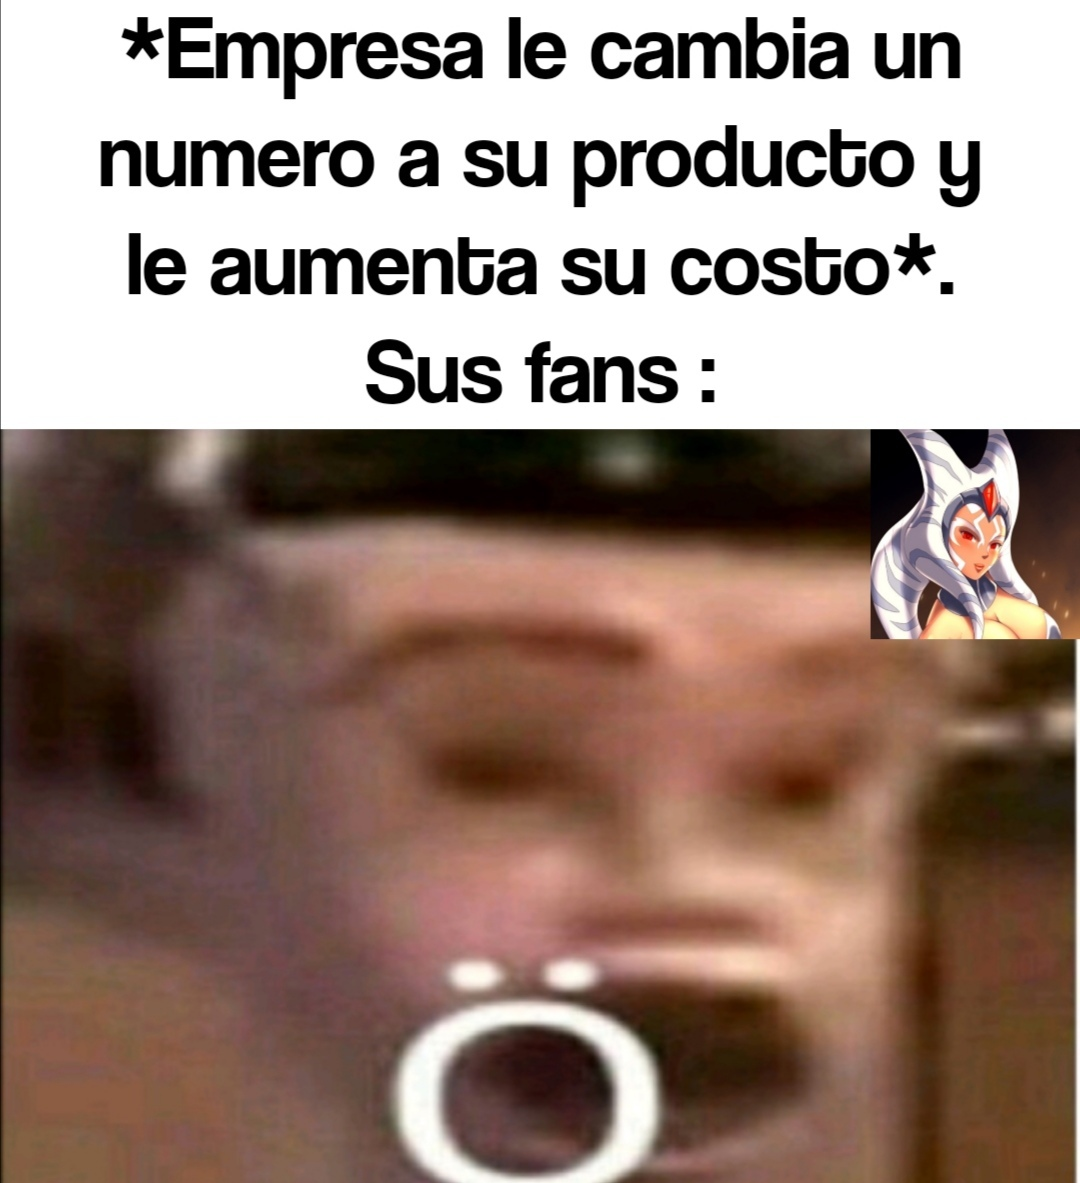 :0 wao - meme